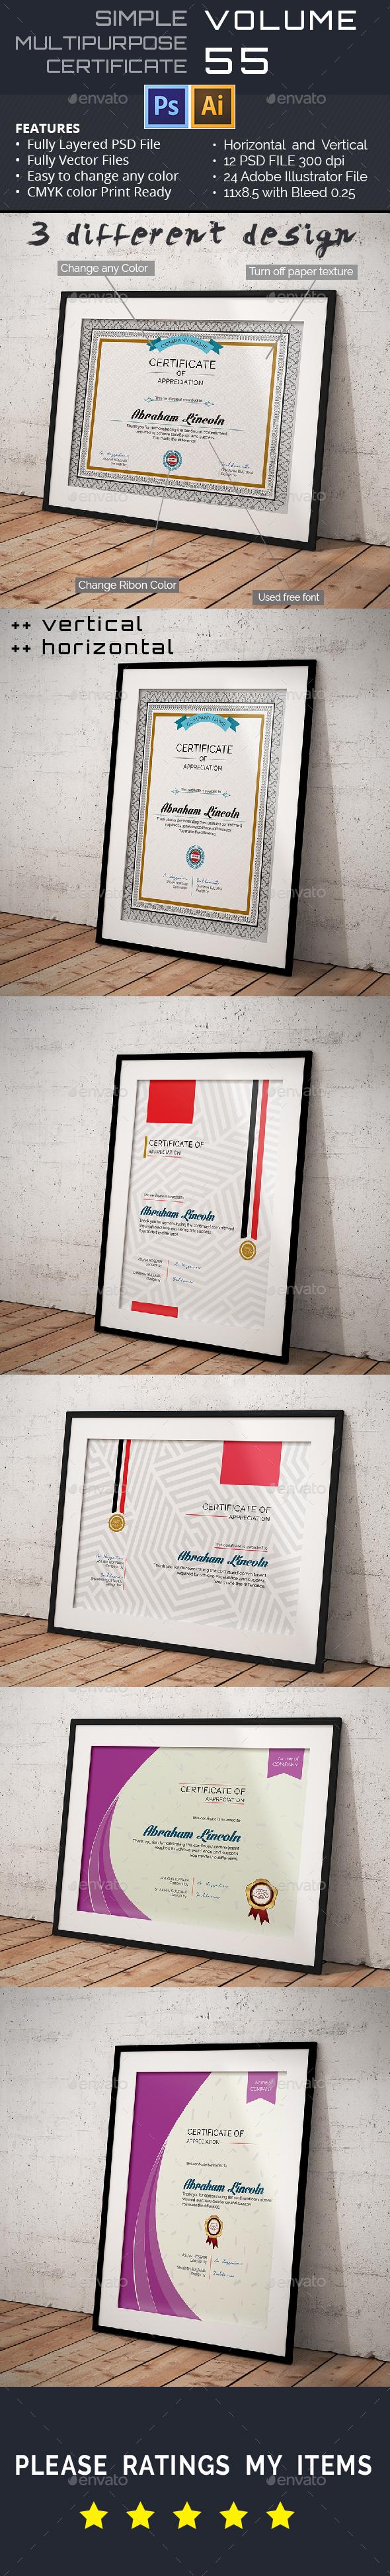 3 Multipurpose Certificate Vol-55 - Certificates Stationery